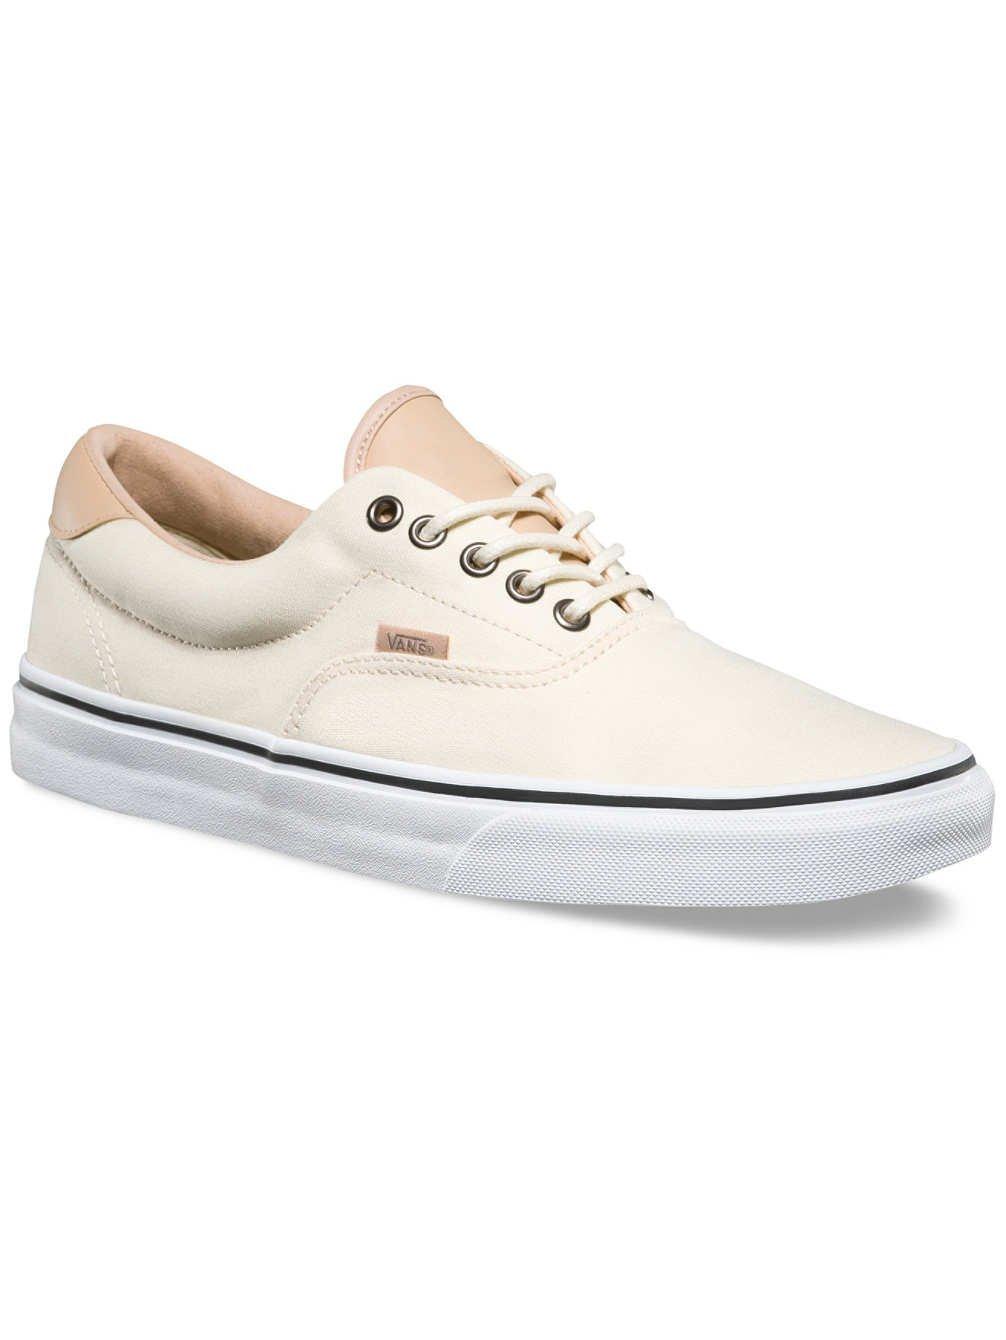 Vans Unisex Era 59 (Veggie Tan) Classic Whit Skate Shoe 8 Men US/9.5 Women US